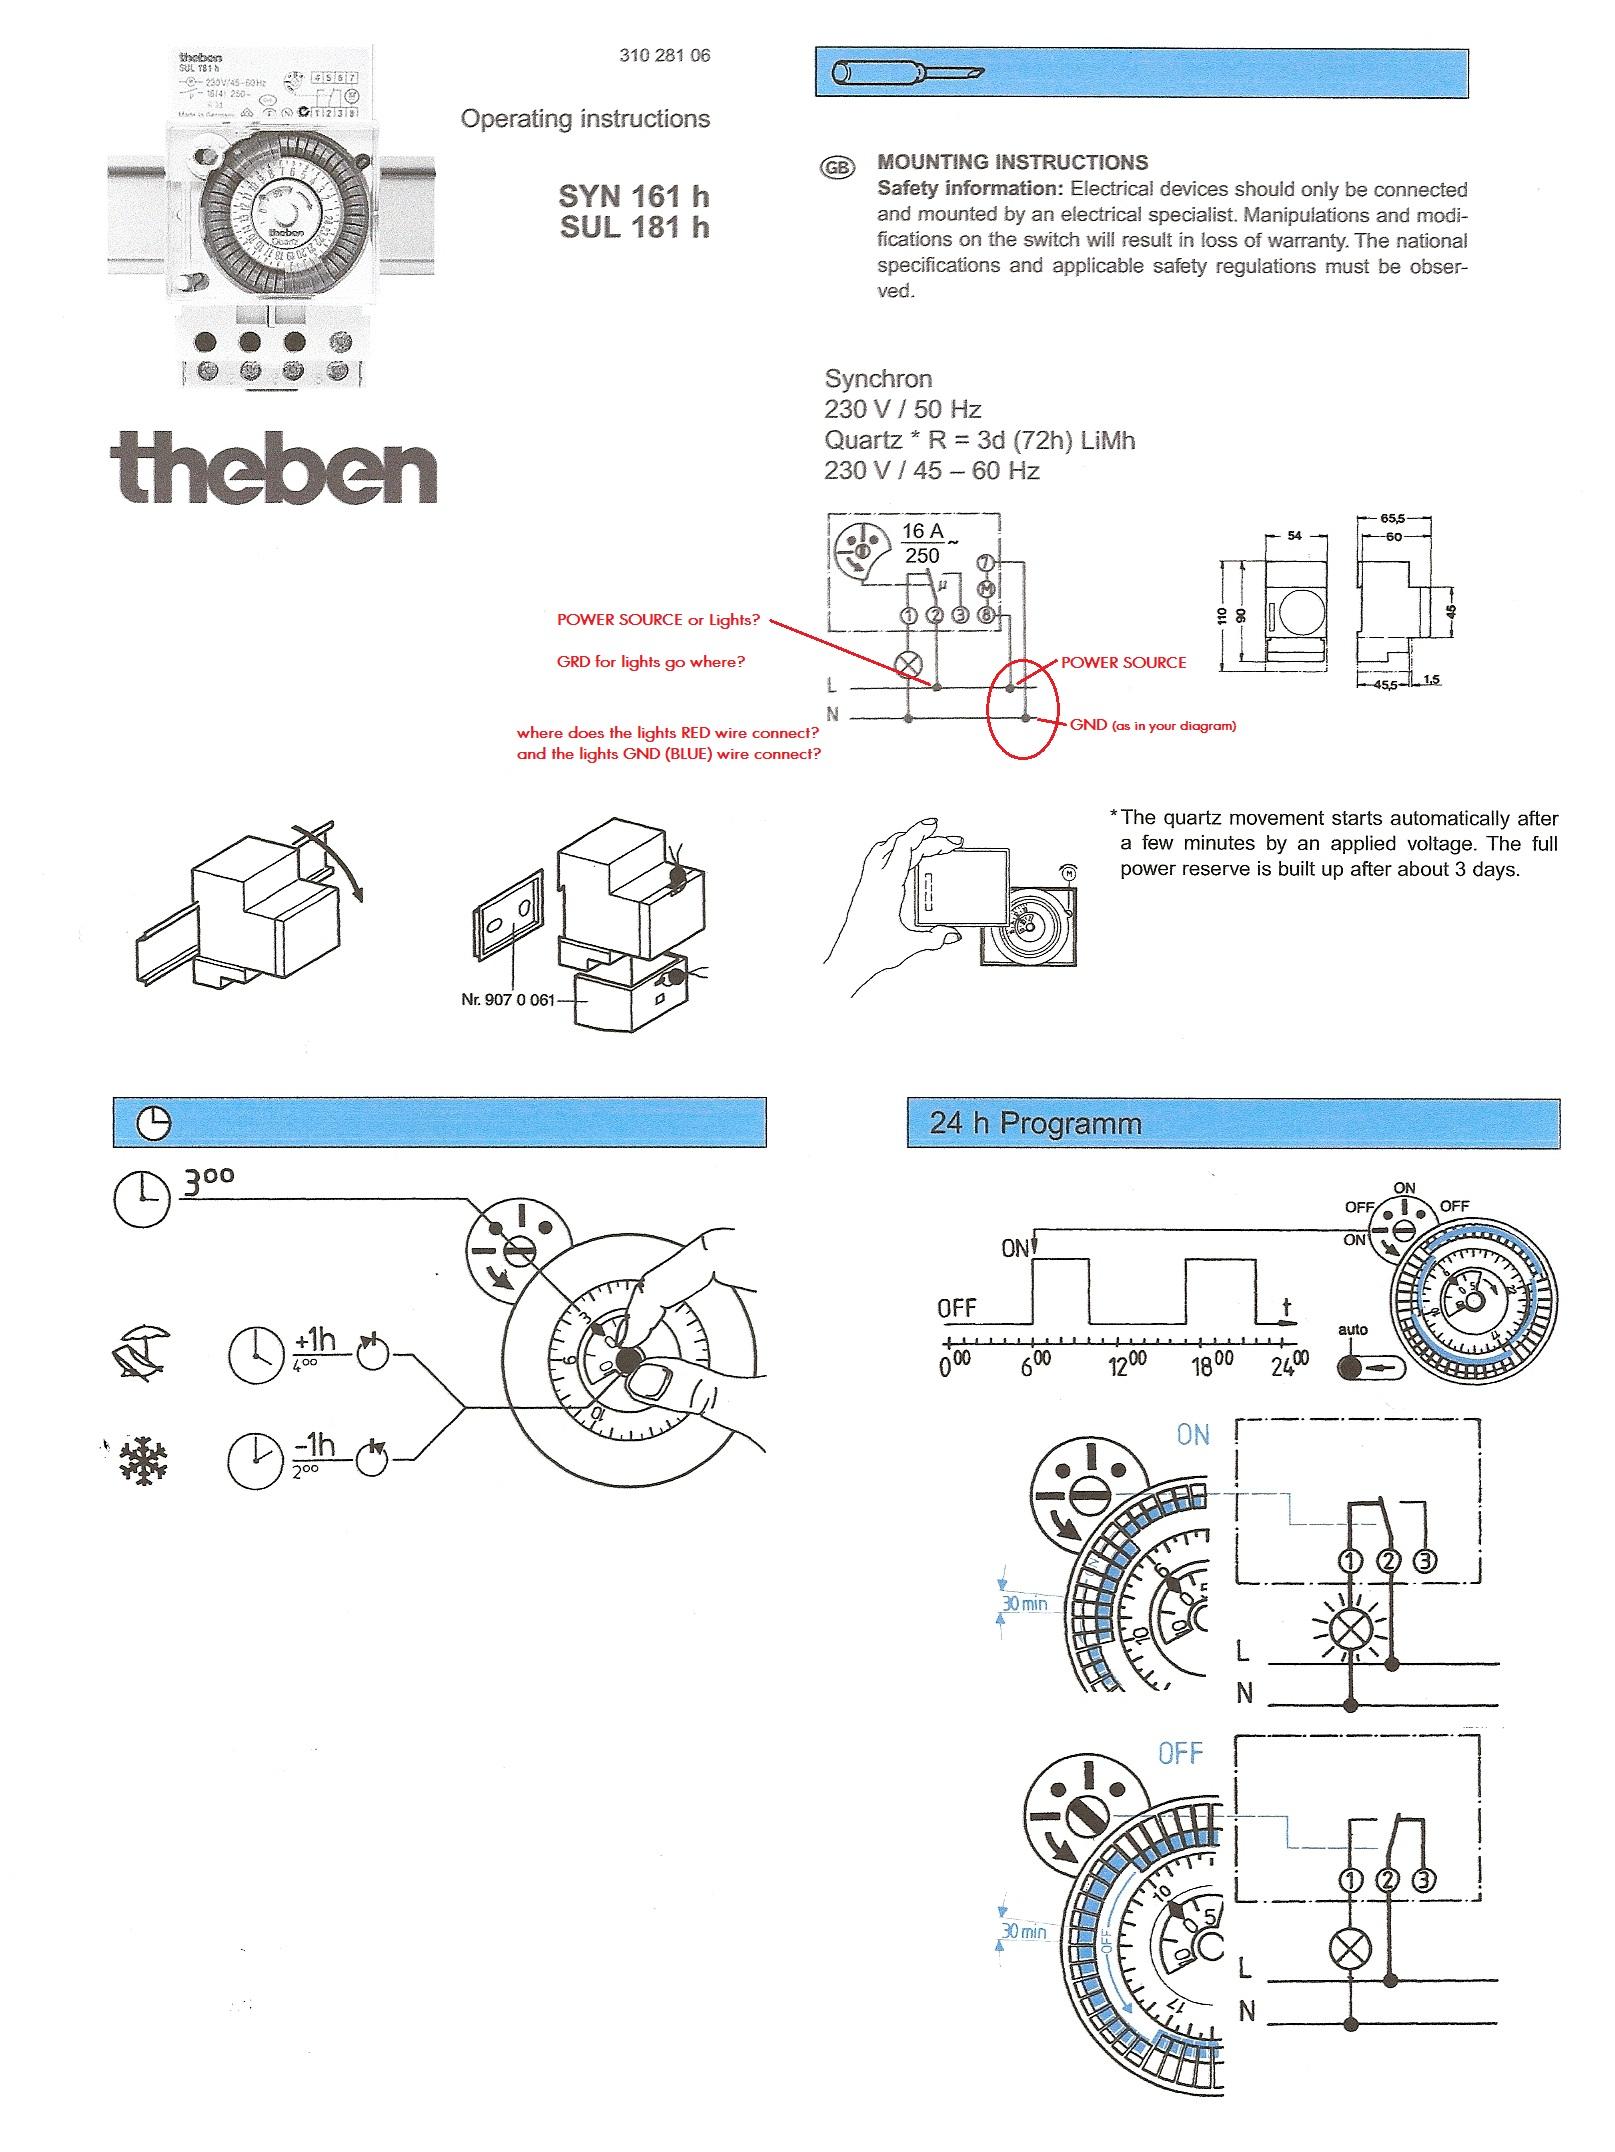 Grasslin Defrost Timer Wiring Diagram Nilzanet – Time Clock Wiring Diagram